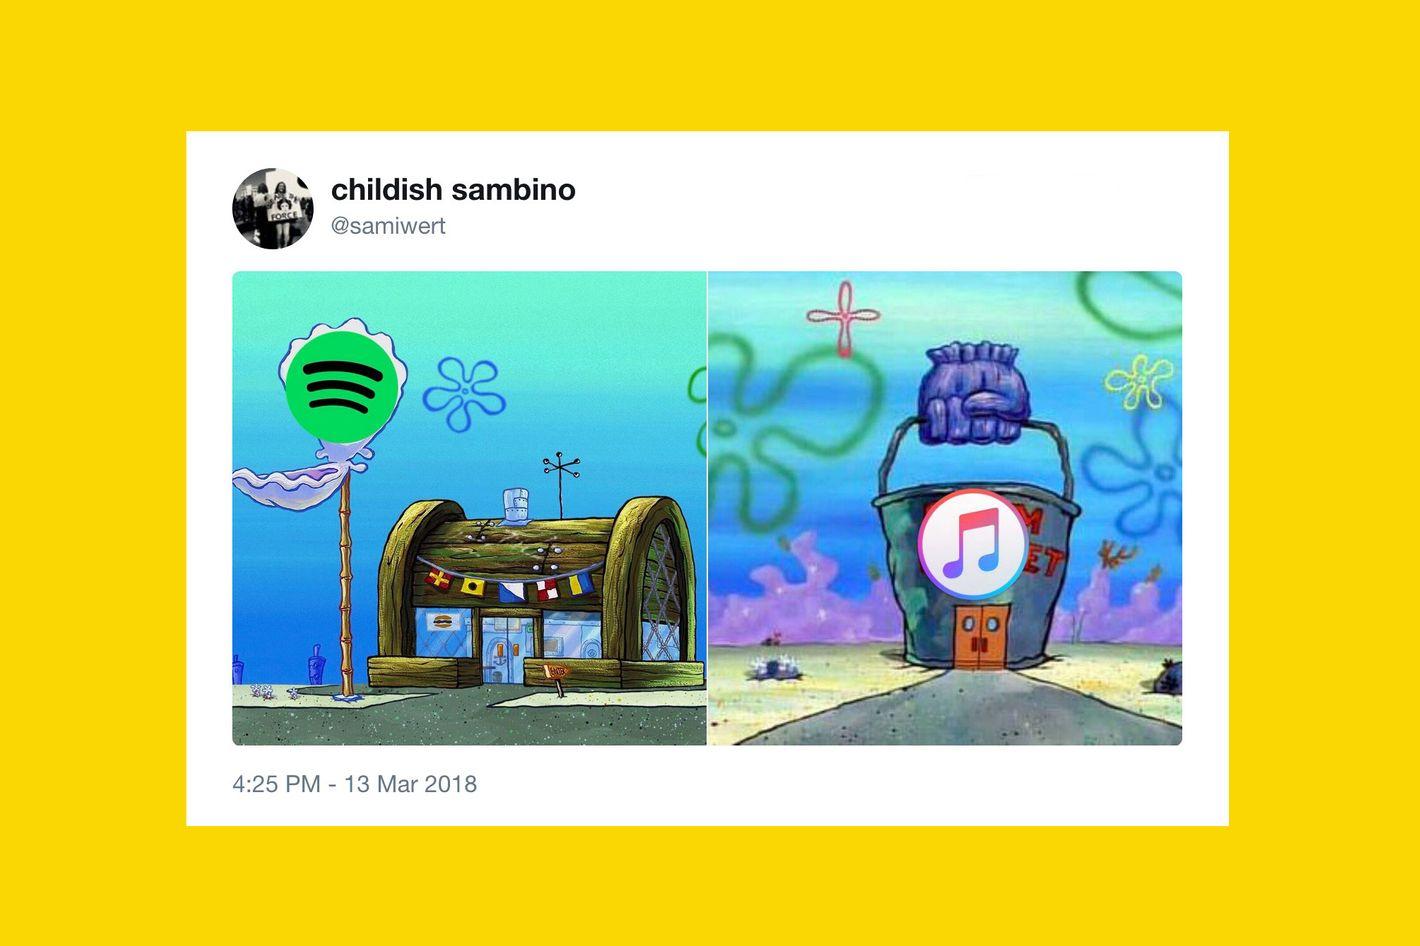 The krusty krabchum bucket rivalry spongebob meme explained